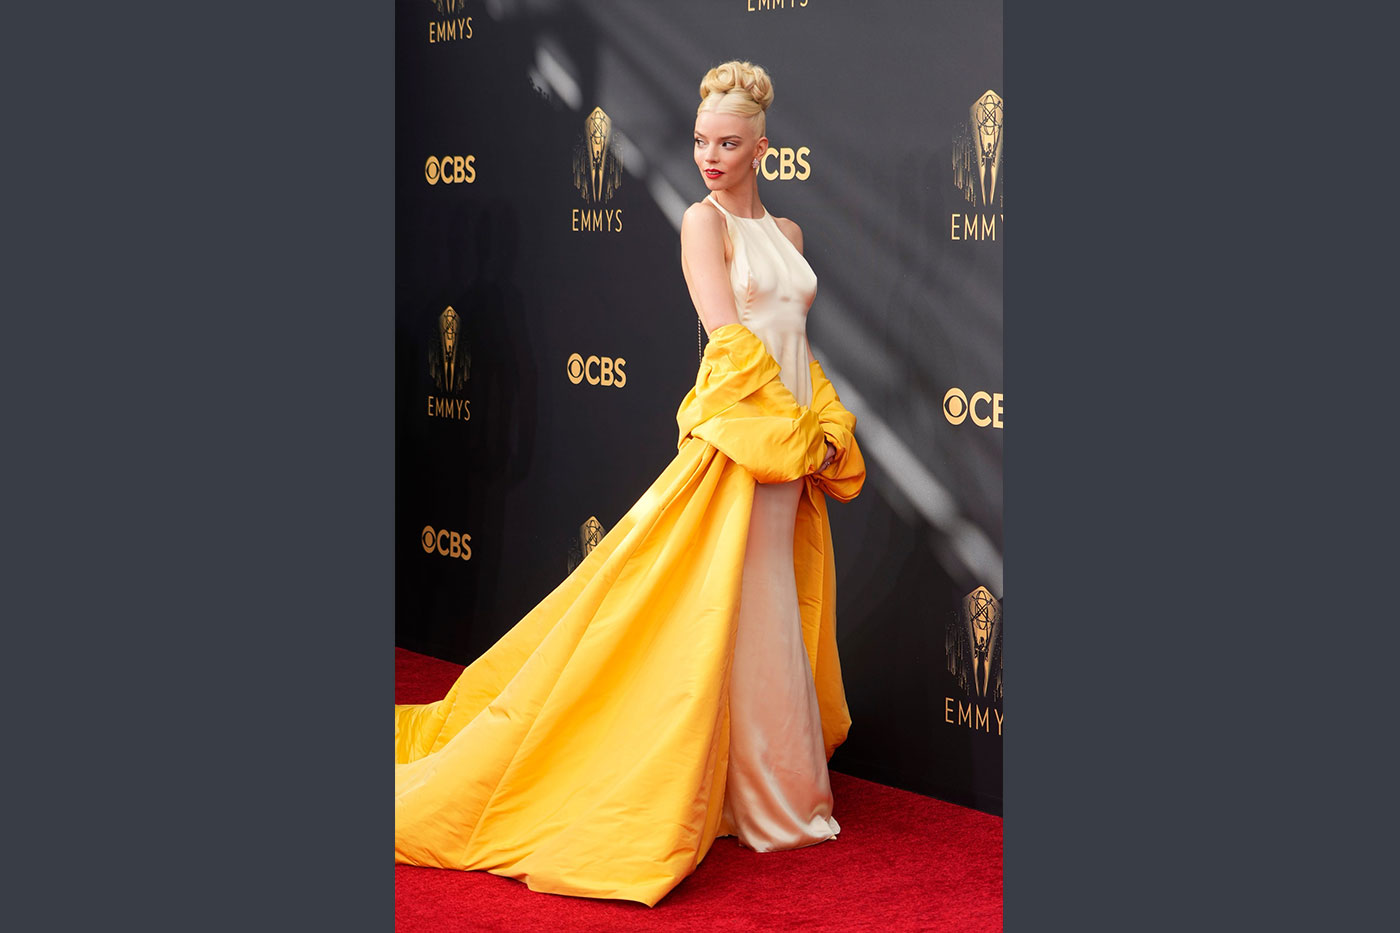 Emmys 2021 – Best fashion looks